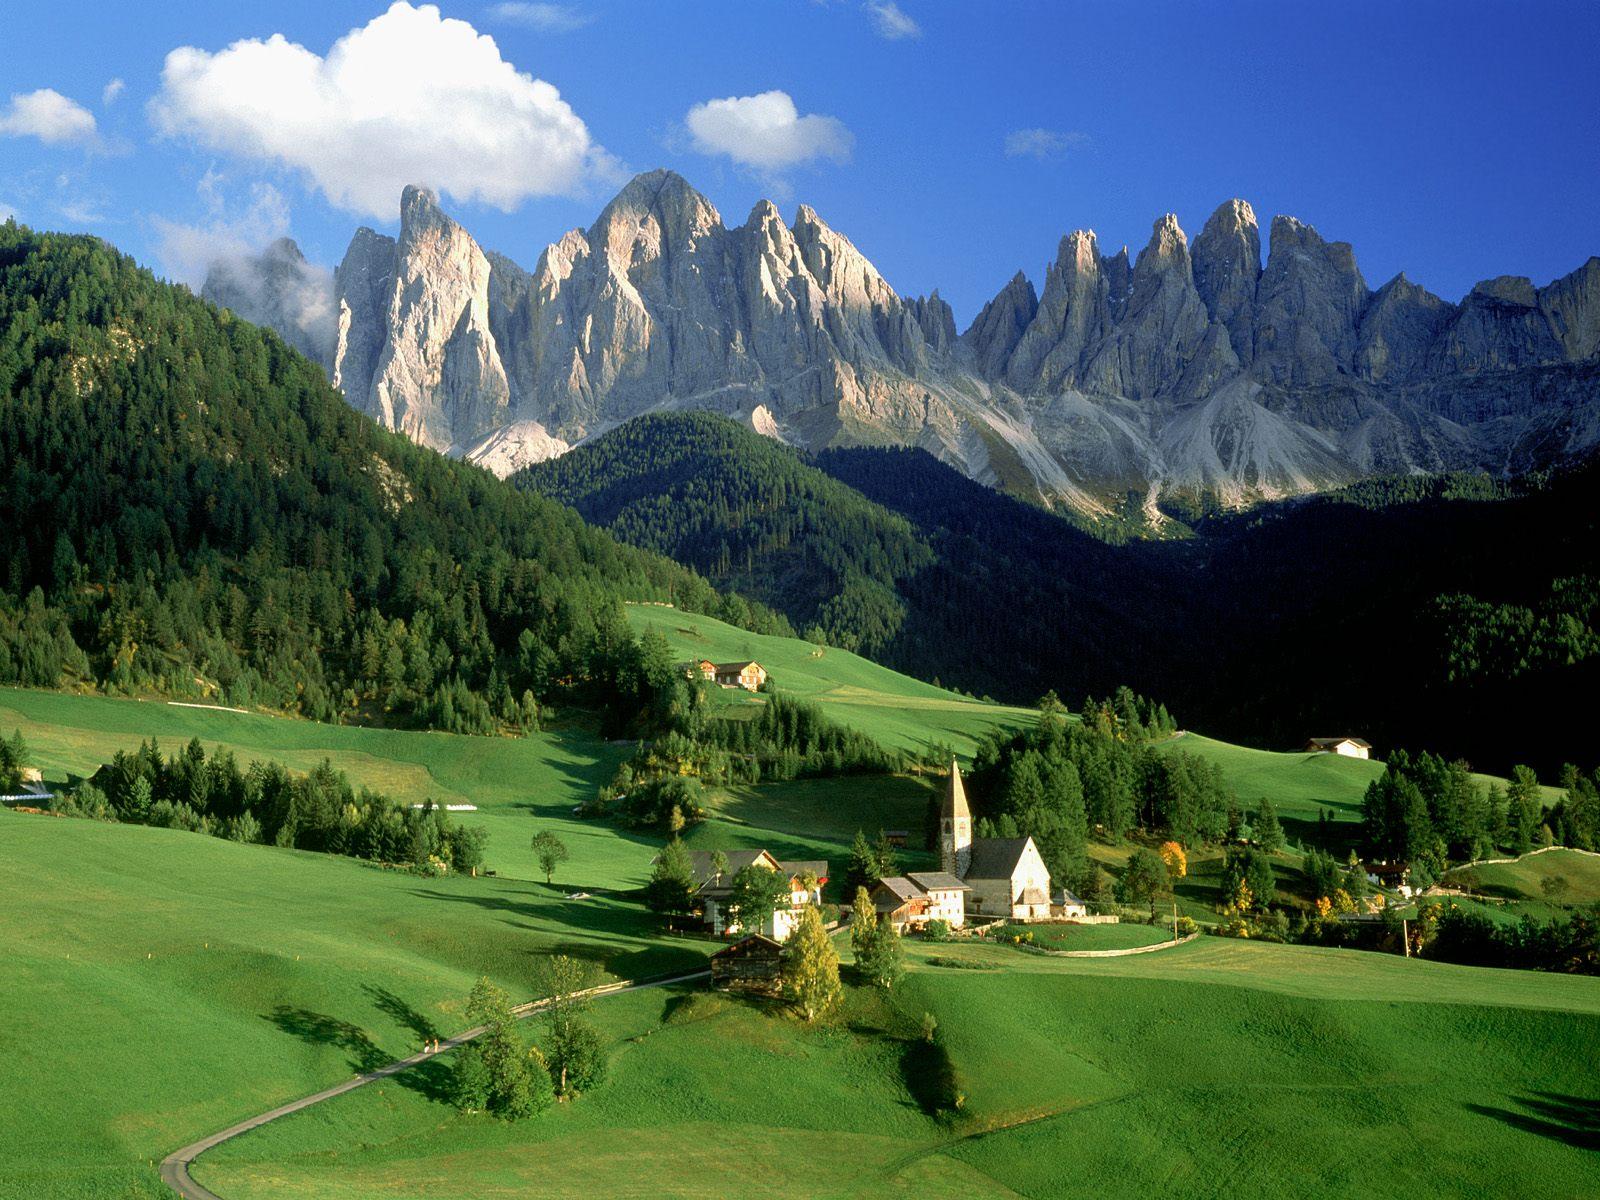 http://3.bp.blogspot.com/_7pNYZd-ao_c/TCtVJaYwdxI/AAAAAAAAAhA/YF_H5kbIxpY/s1600/Val+di+Funes_+Dolomites_+Italy.jpg